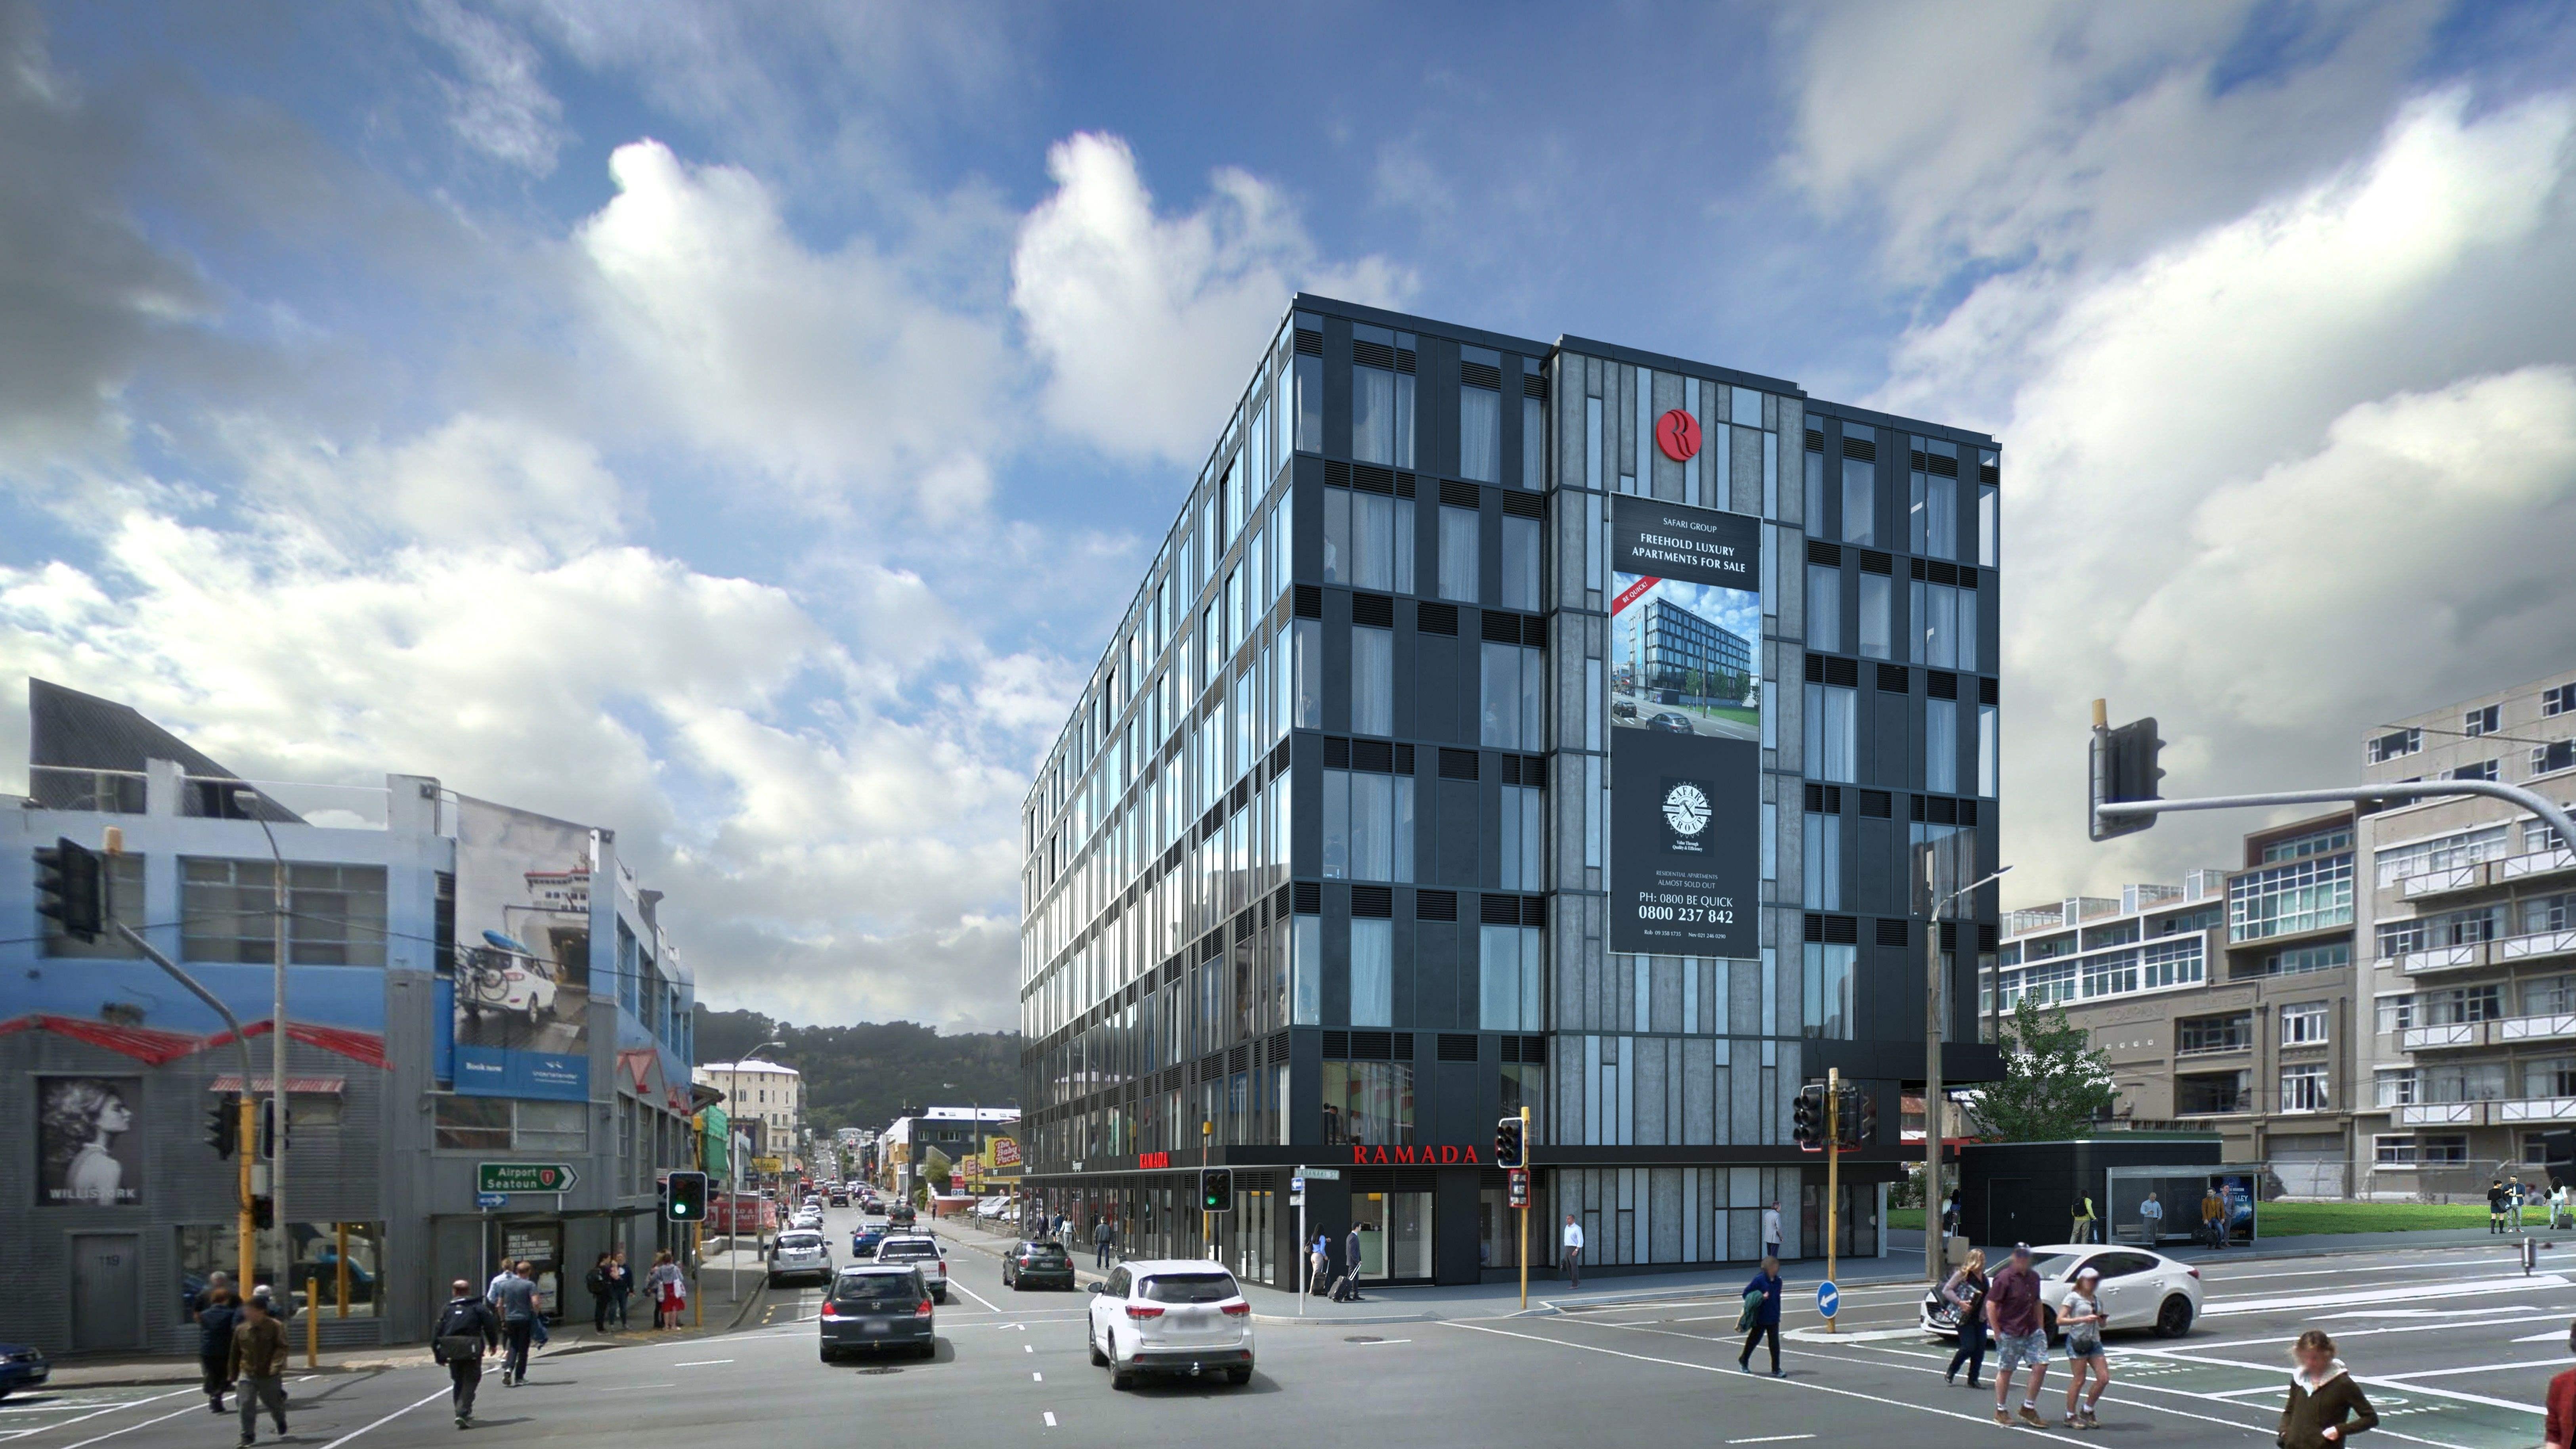 Wellington Central 一手价格 坐等升值!华美达惠灵顿市中心全新公寓 欢迎海外投资者购买!